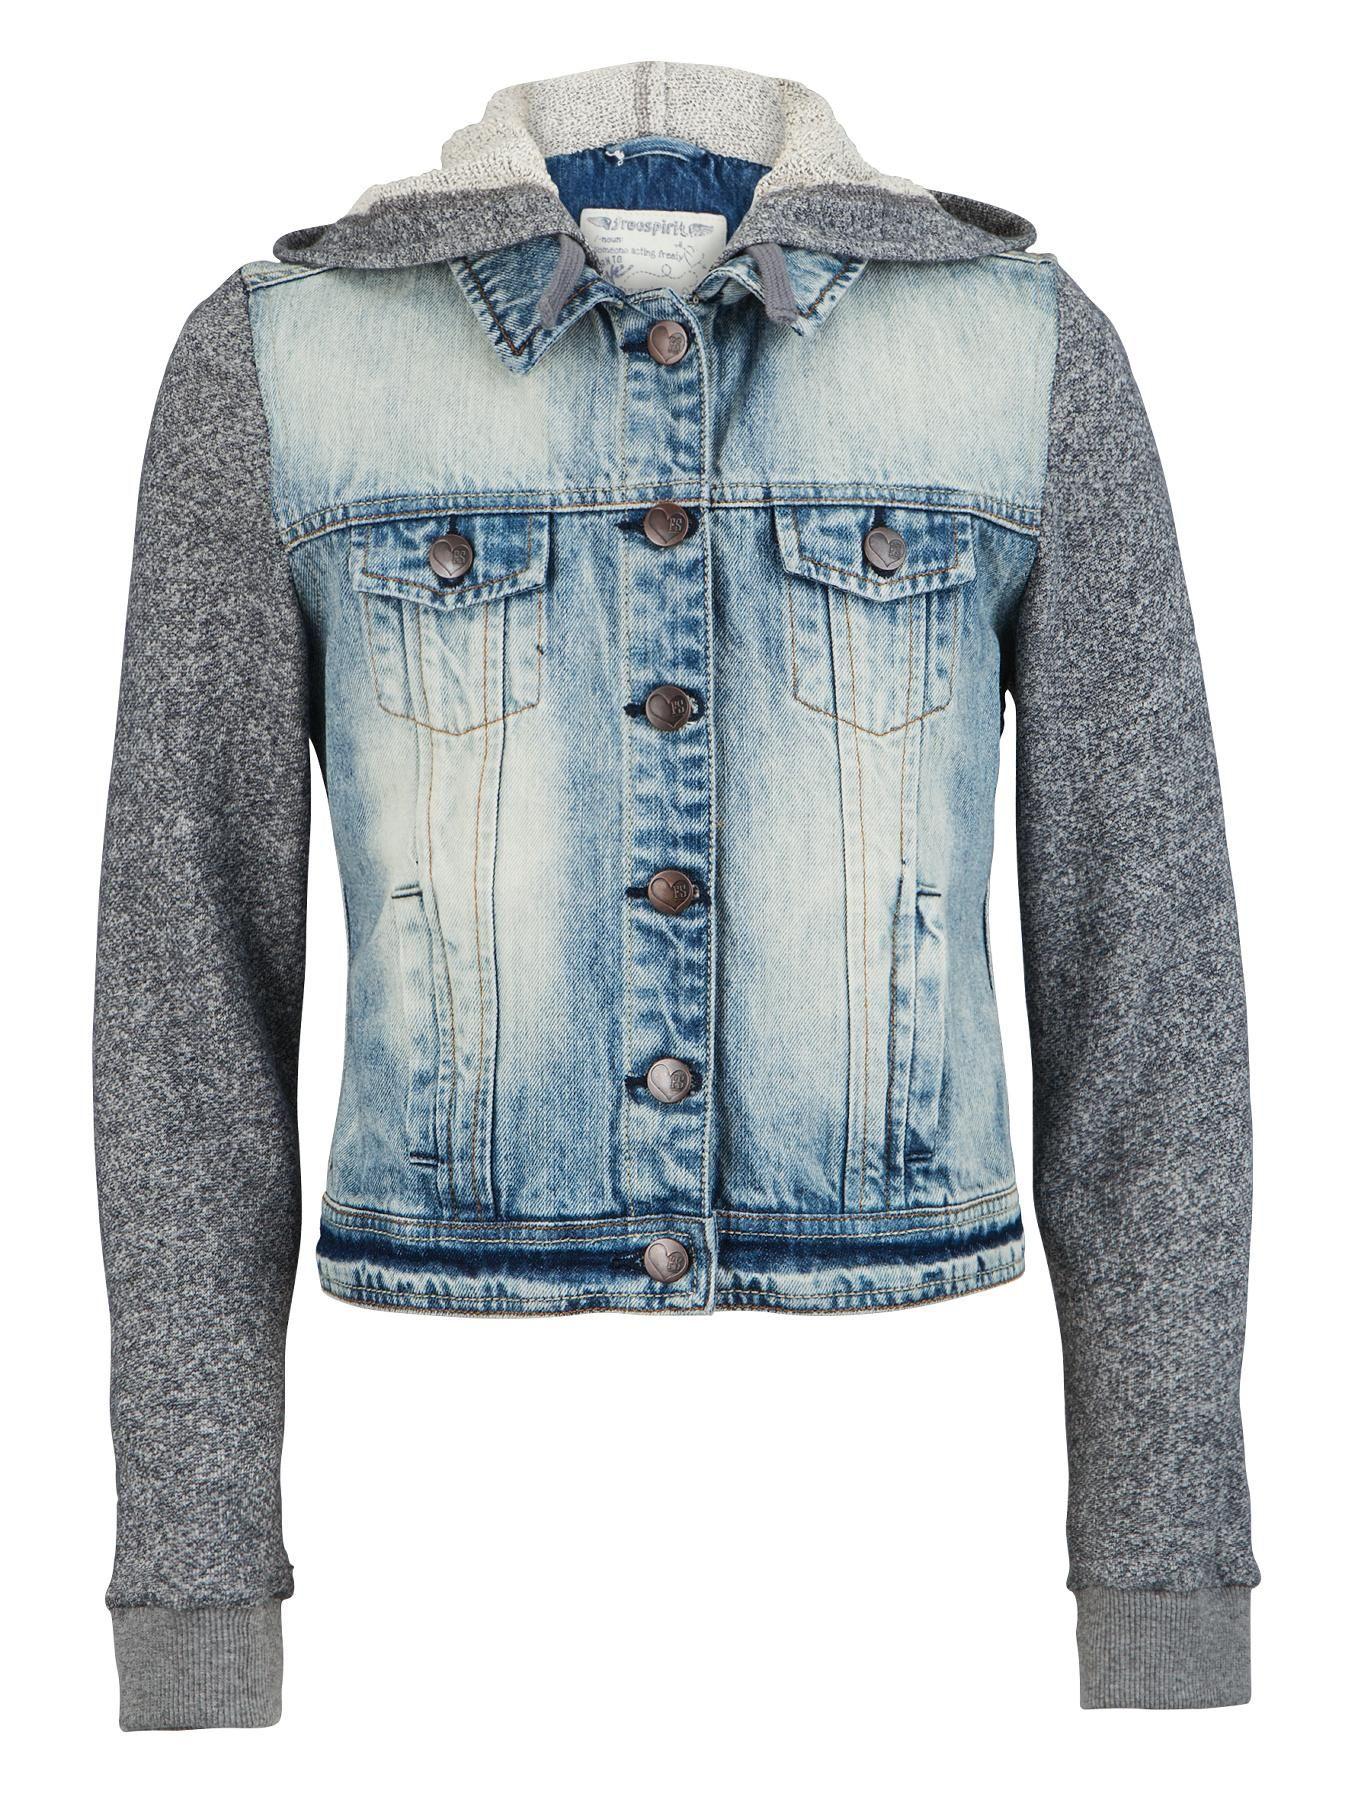 Freespirit Girls Denim Jacket with Marl Sleeves | very.co.uk ...